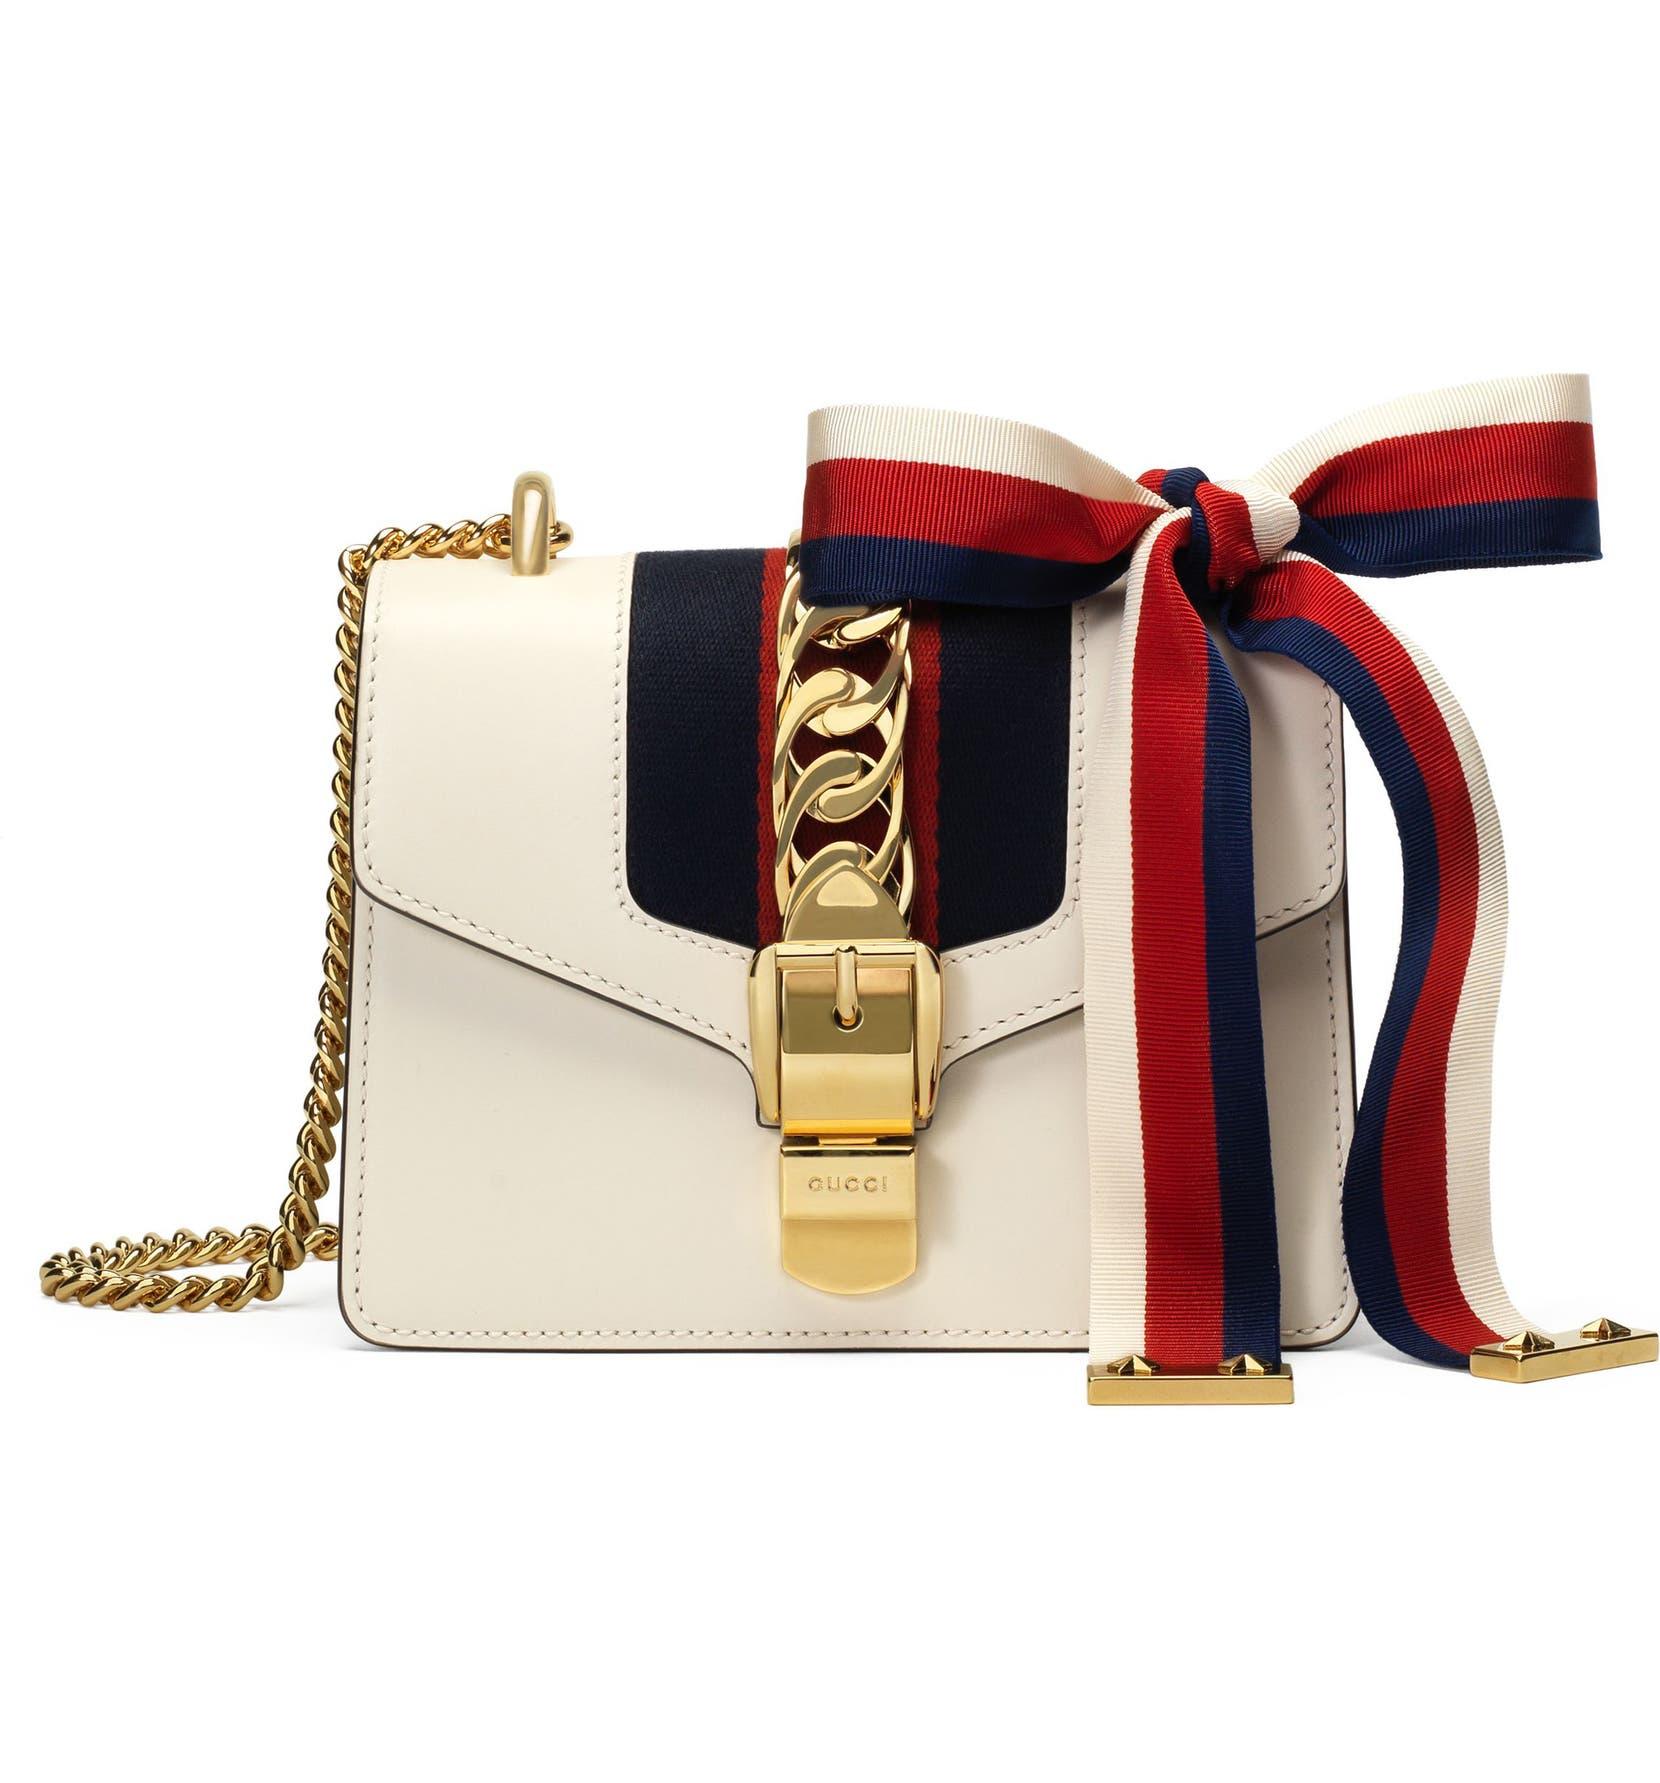 d8a426e08210 Gucci Mini Sylvie Leather Shoulder Bag | Nordstrom